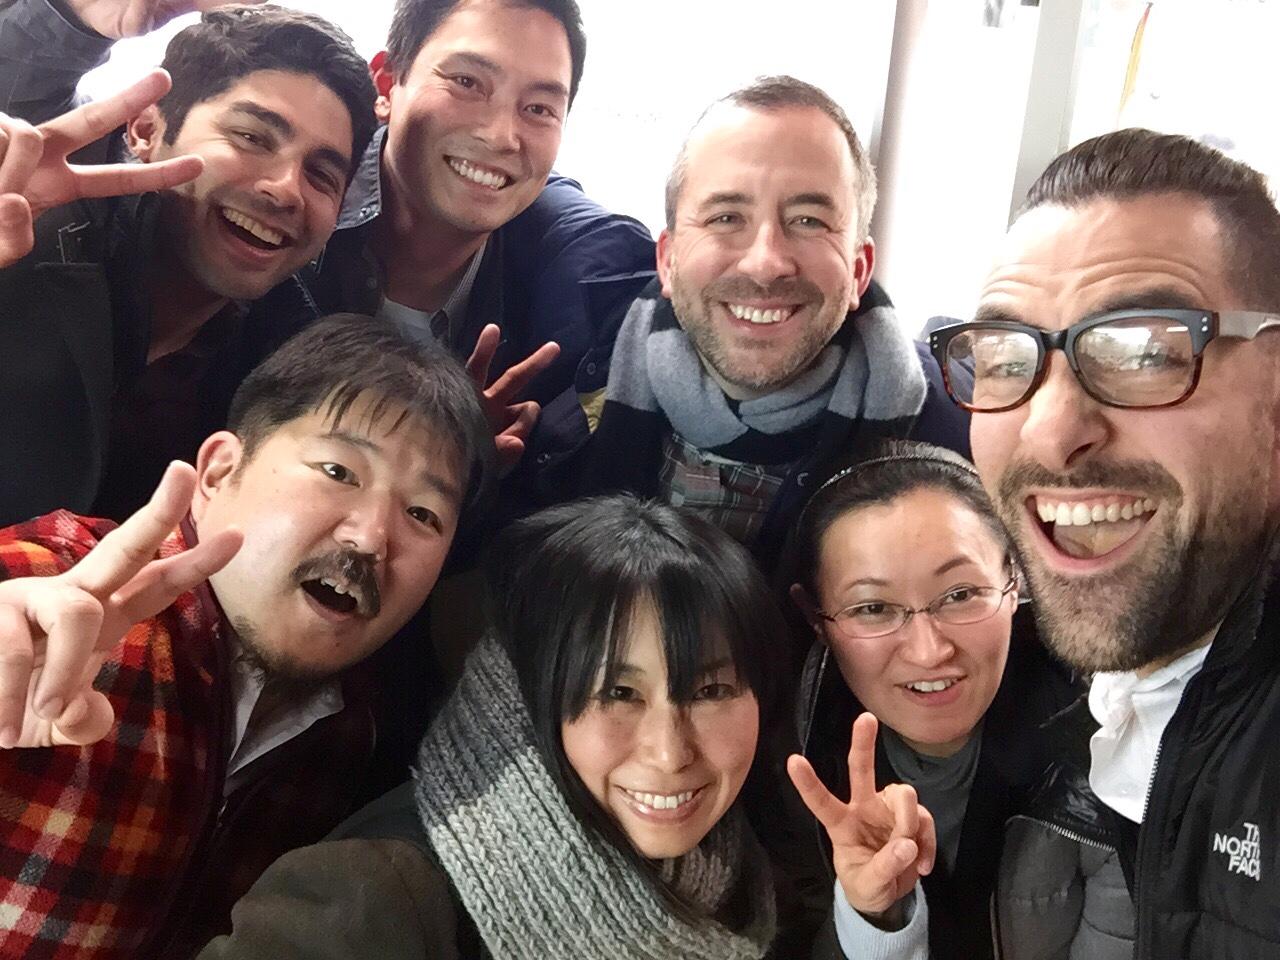 From left to right: Merrick, Trevor, Bill, Myself, Nobu, Tae, and Izumi